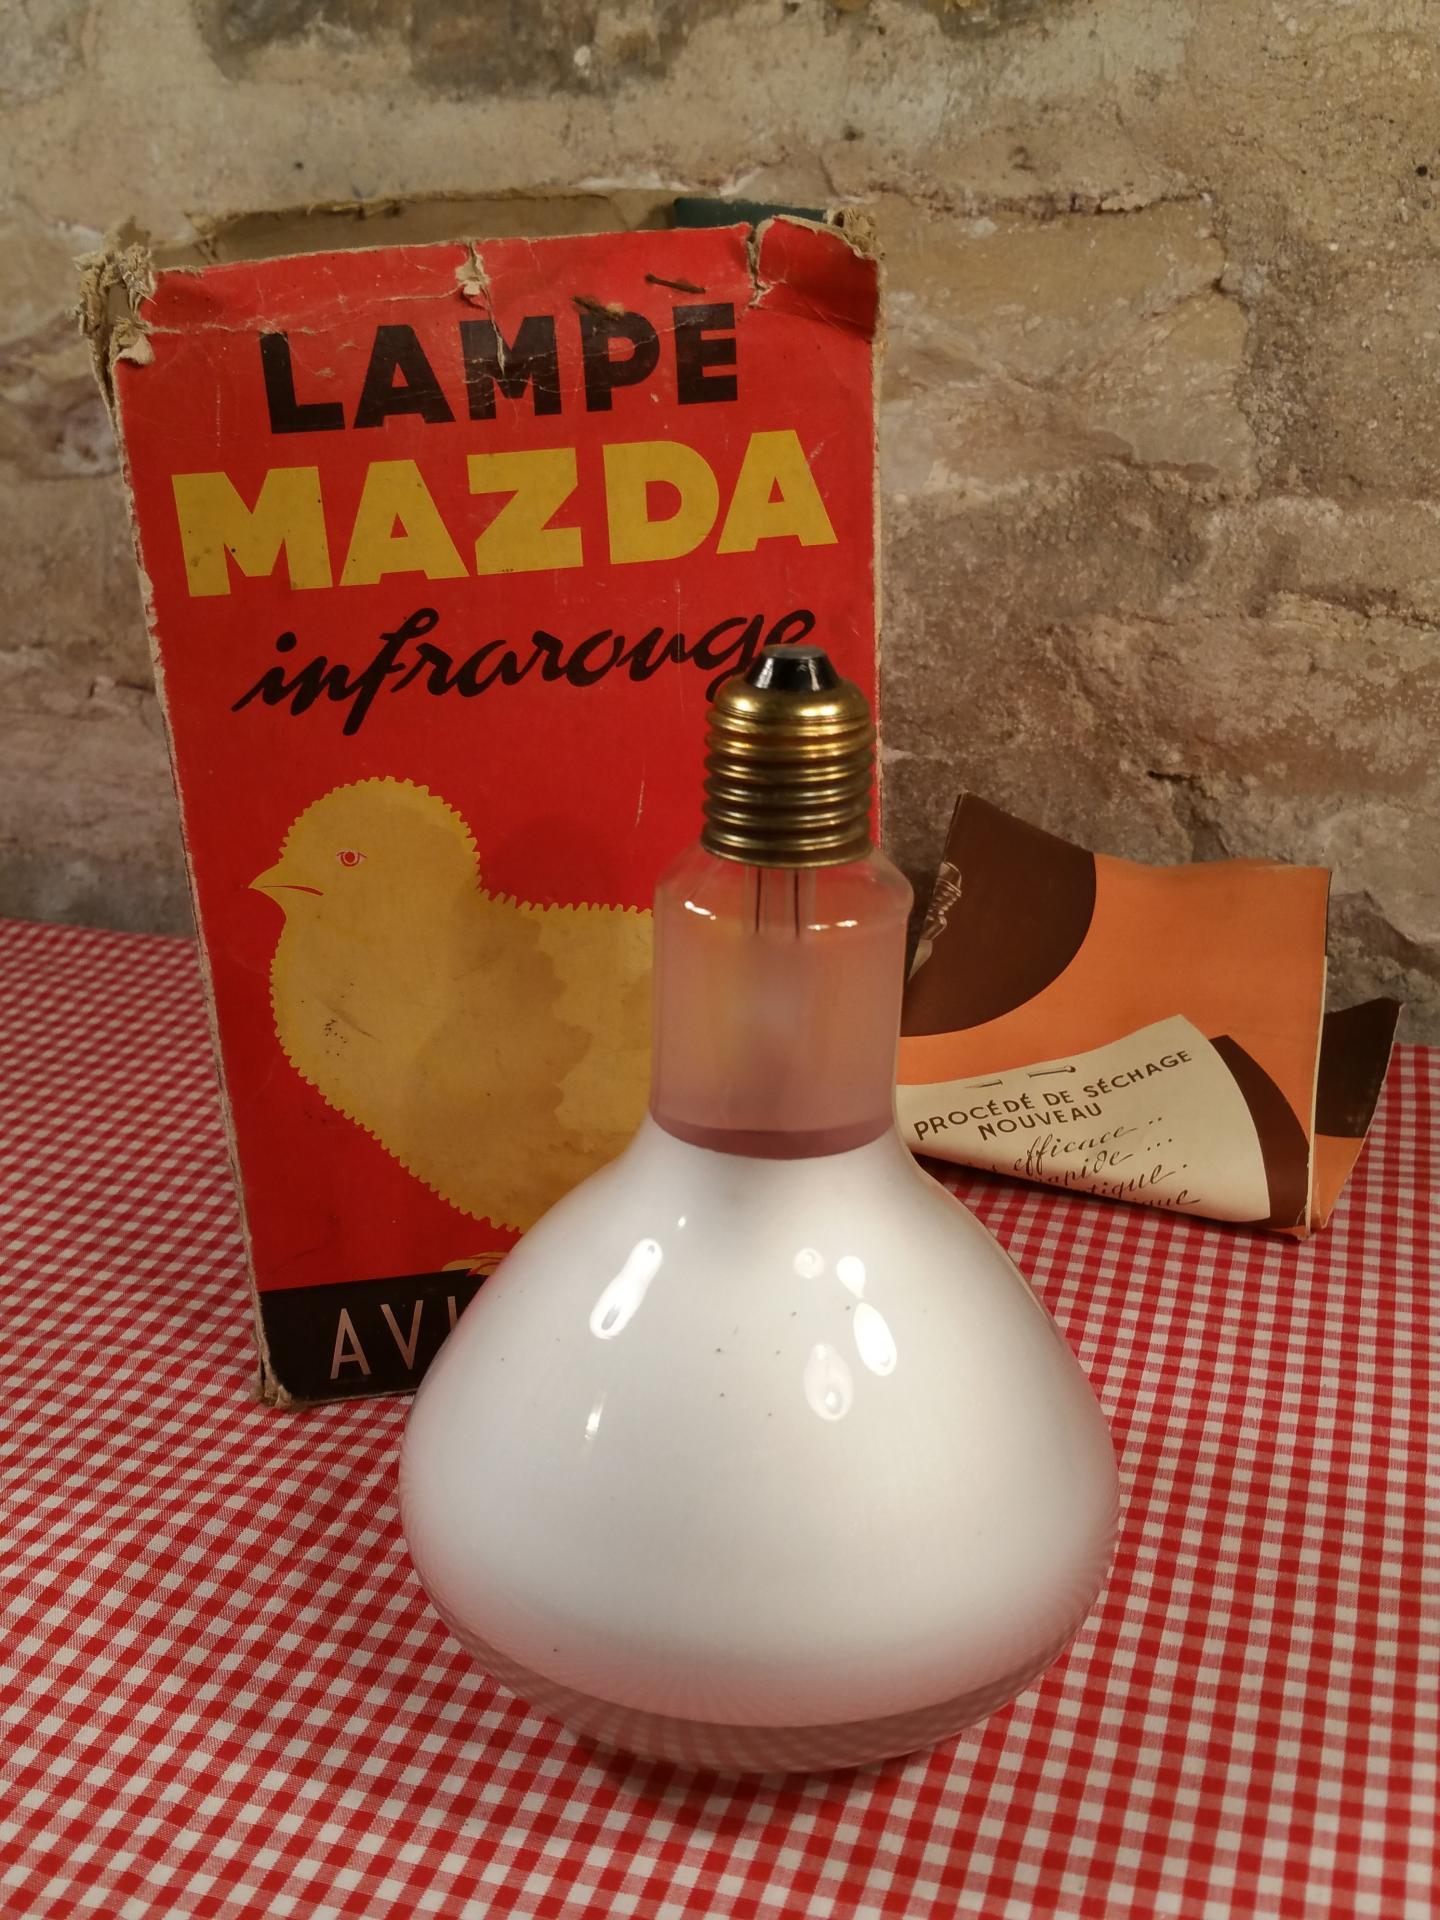 Ampoule infrarouge mazda lampe infrarouge - Lampe infrarouge cuisine ...